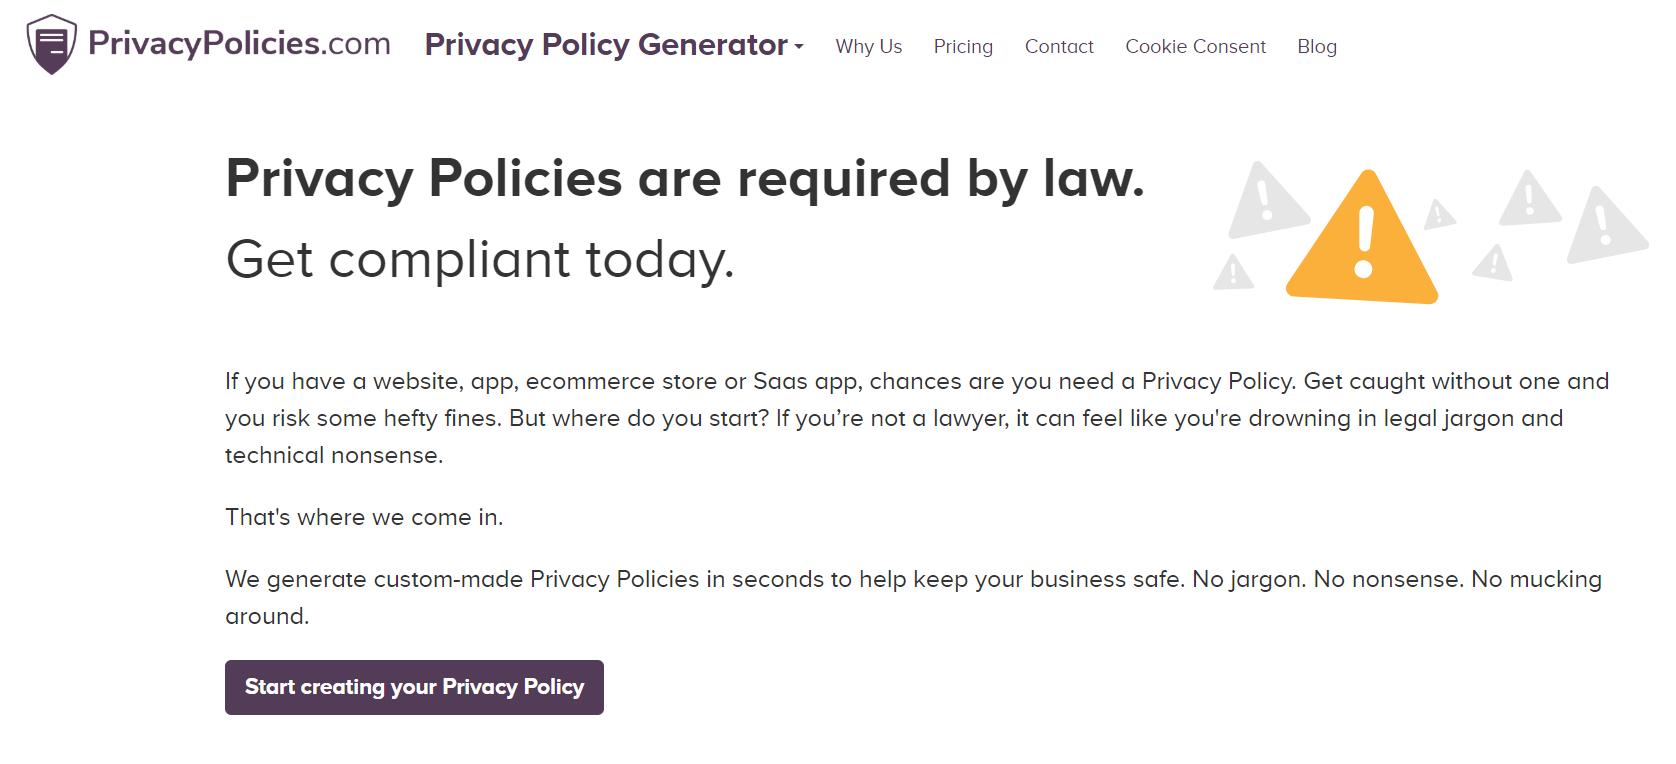 Privacy Policies Review- 1 Privacy Policy Generator Free GDPR CalOPPA